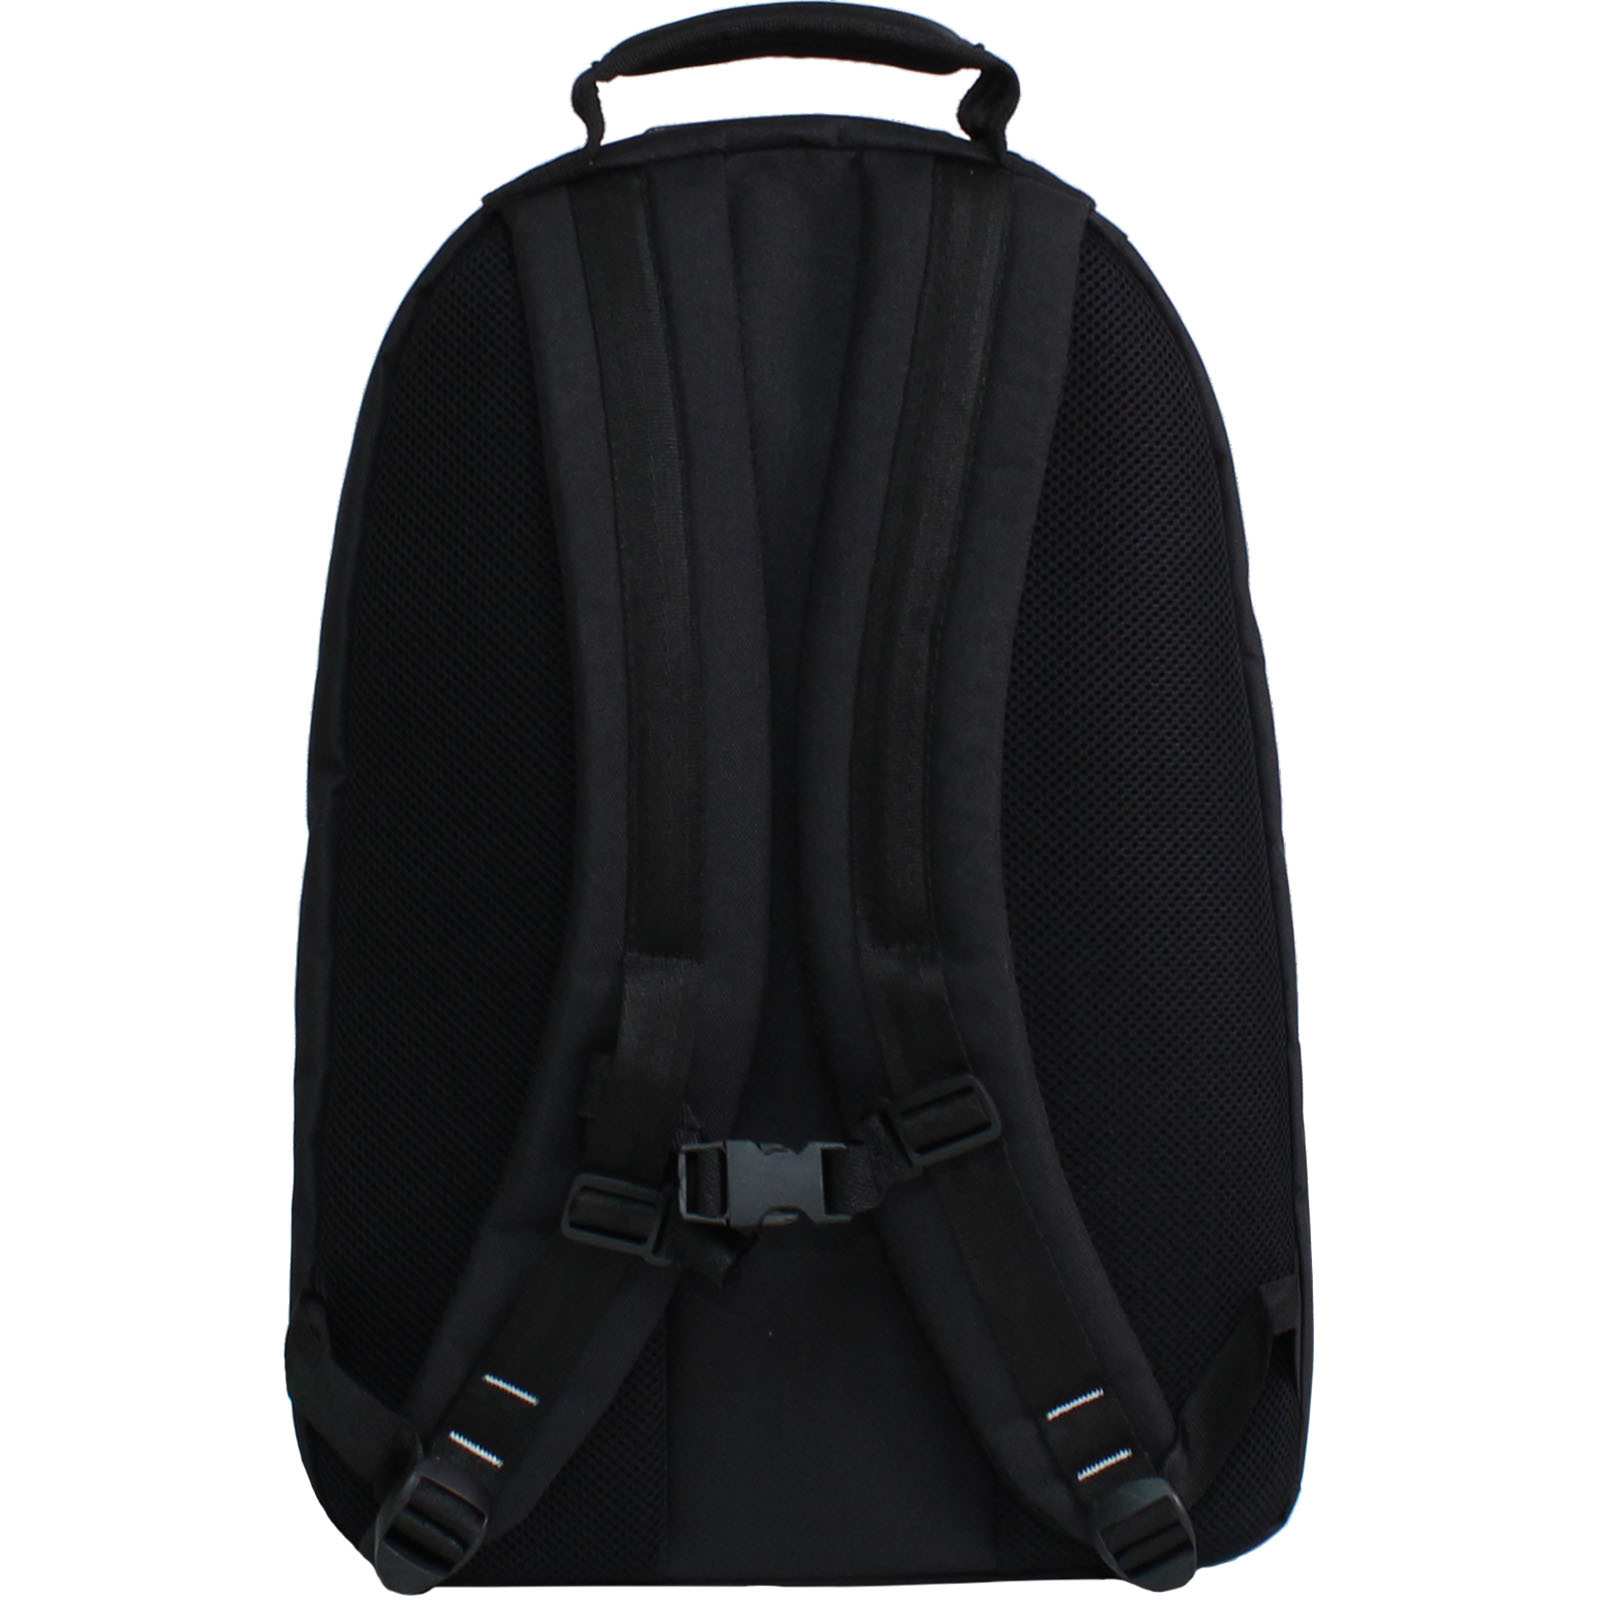 Рюкзак для ноутбука Bagland Рюкзак ZOOTY 24 л. Чёрный (00531662) фото 3